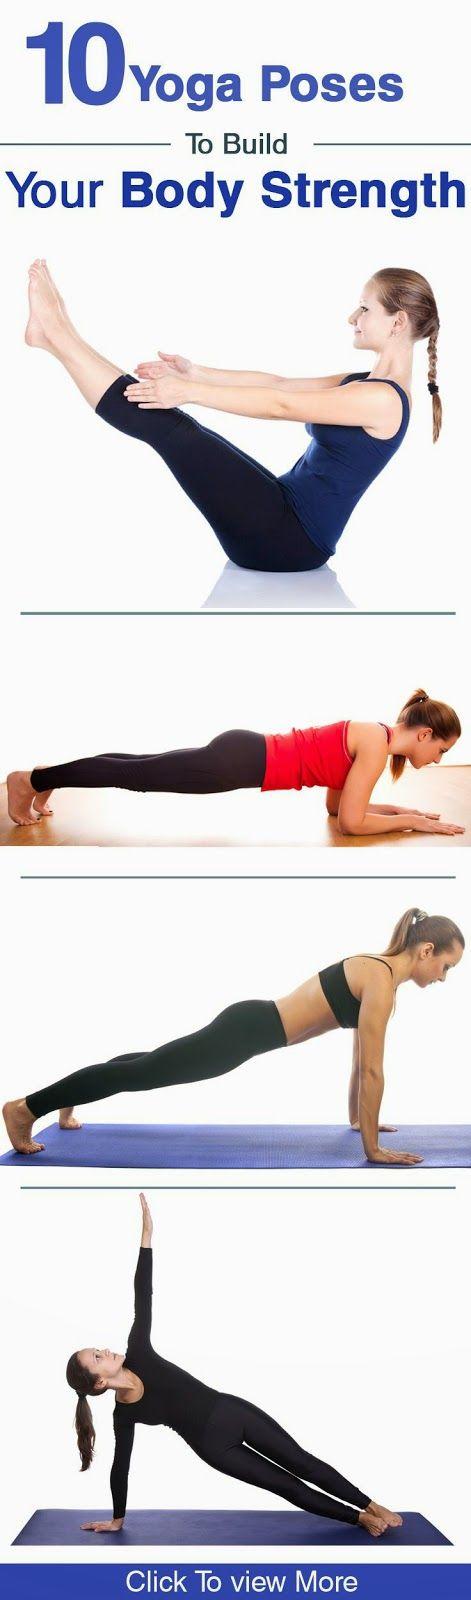 Yoga Poses for Body Strength